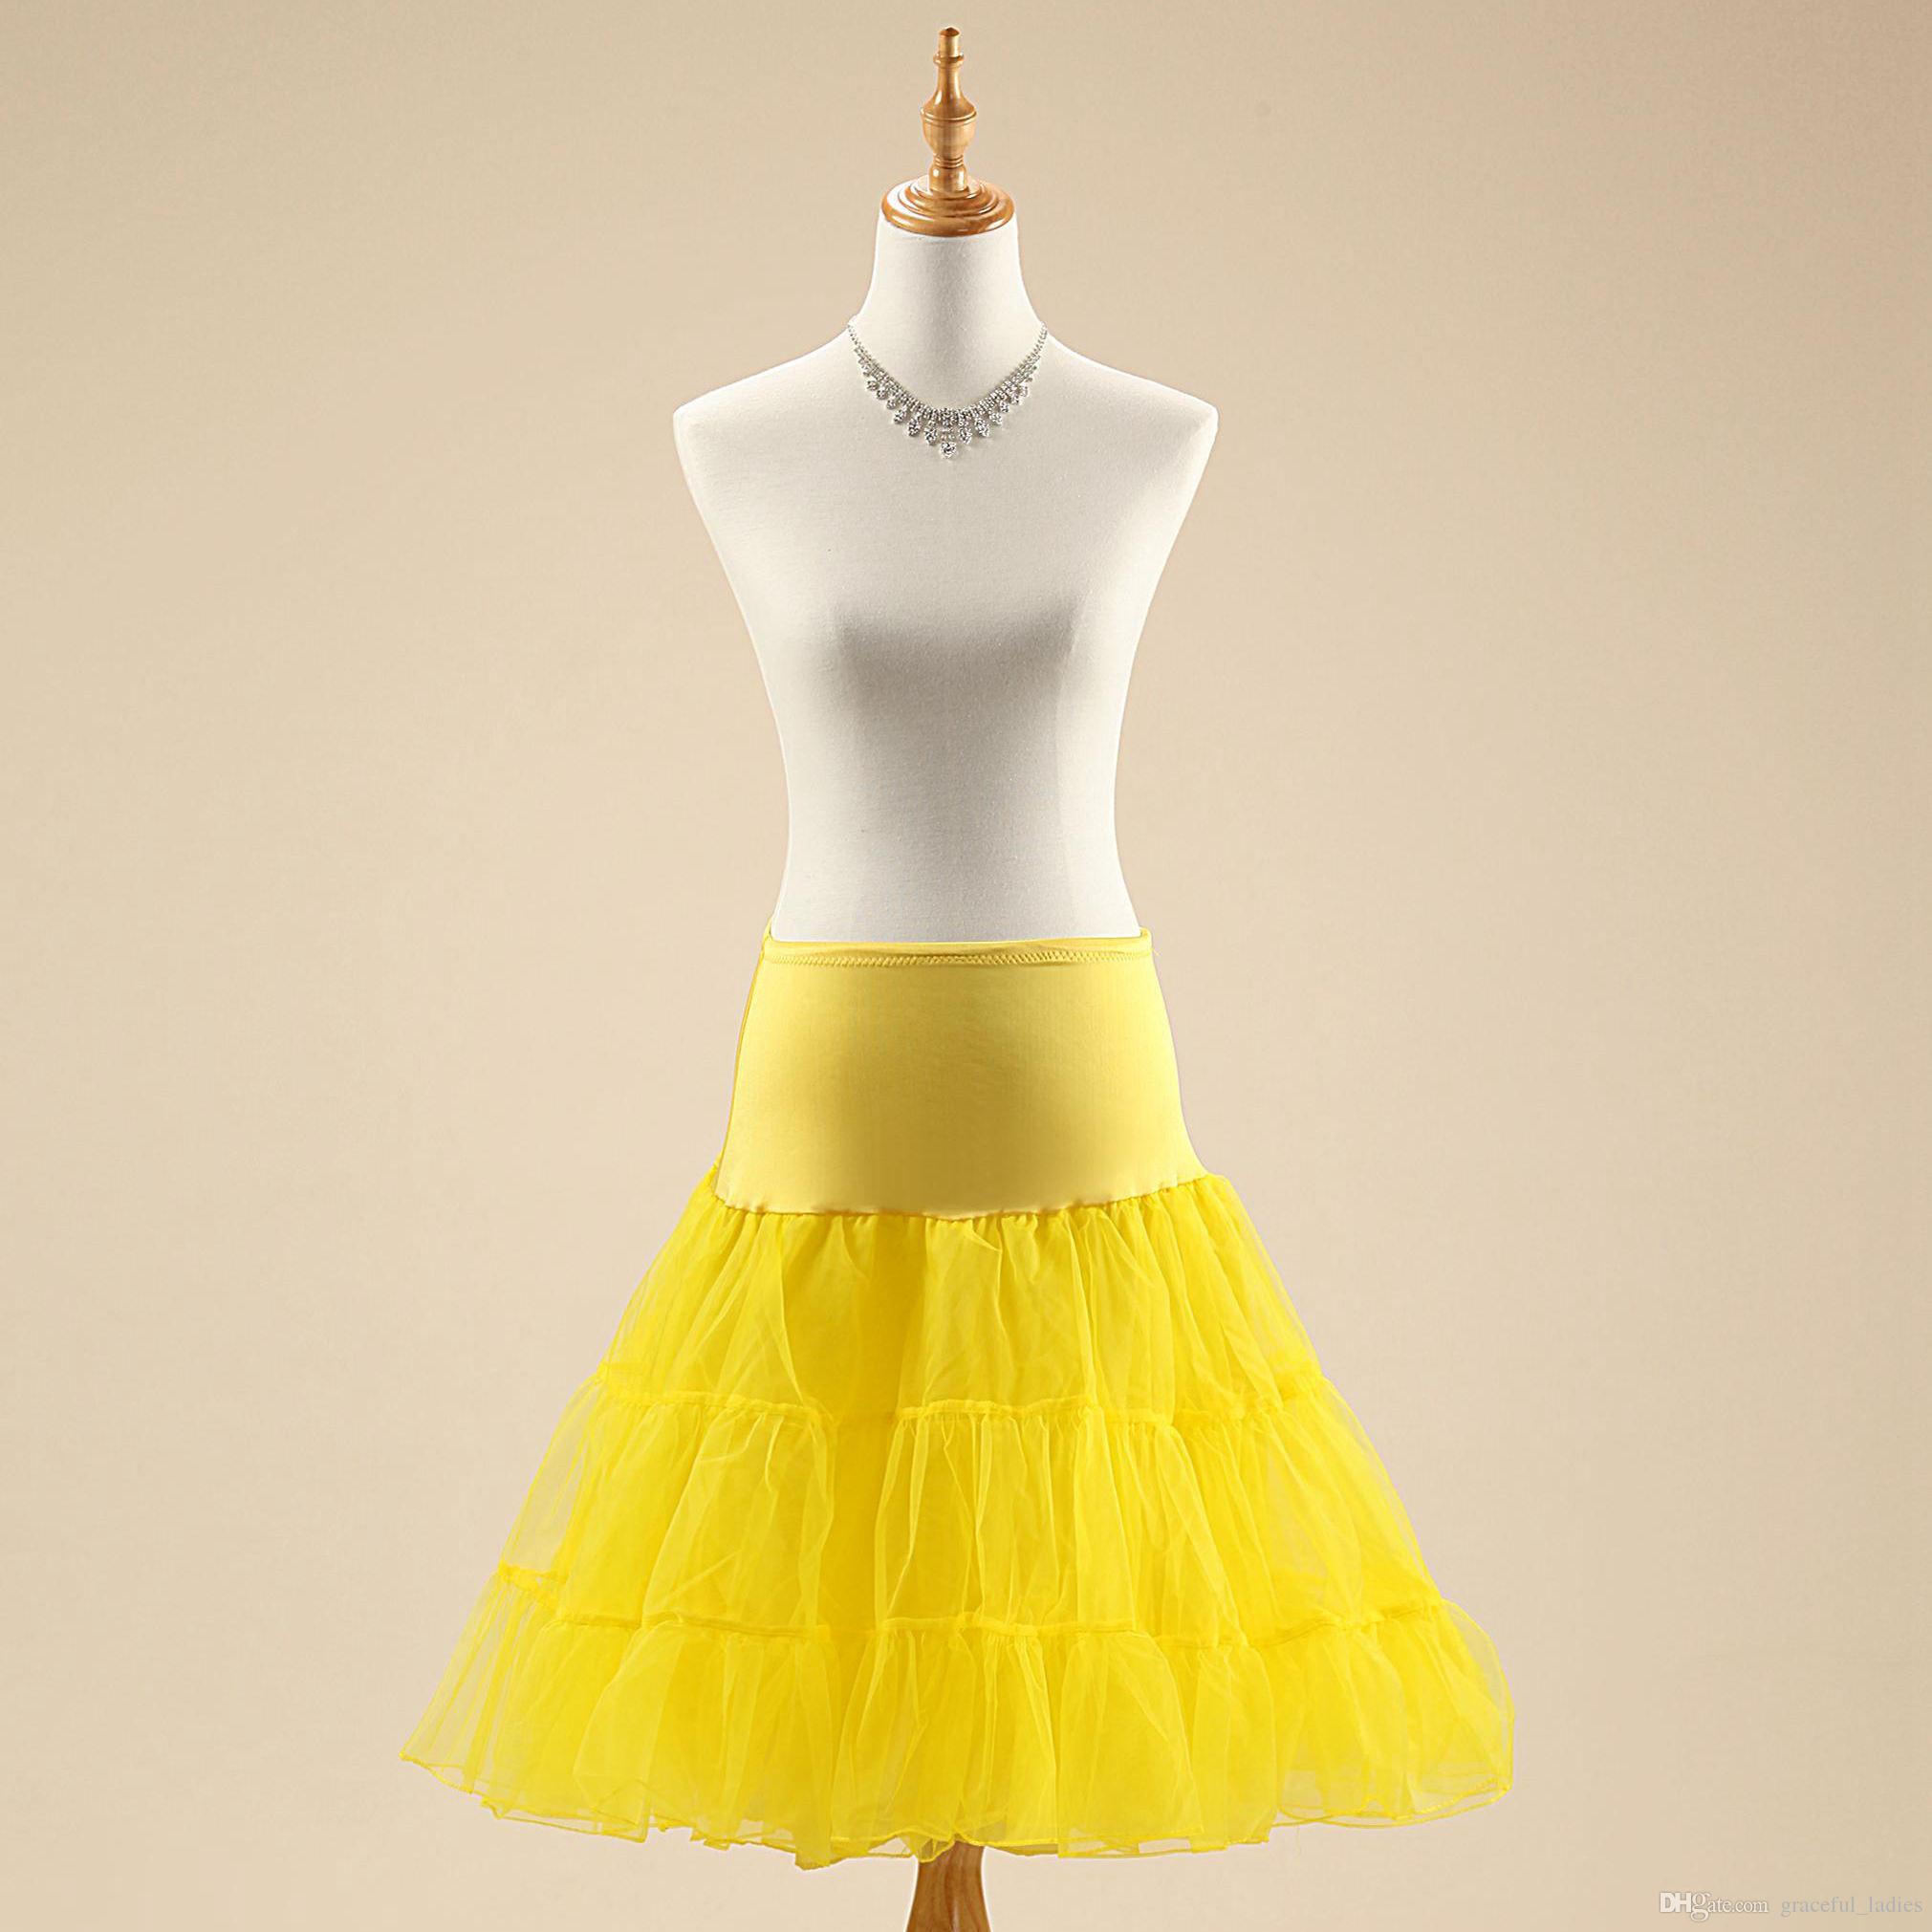 12 sztuk Kolor Ślub Petticoats Suknia Suknia Ślubna Petticoat 3 Tier Długość Kolana Dress Suknia Slip Cocktail Petticoat Dzieci Pelteroat